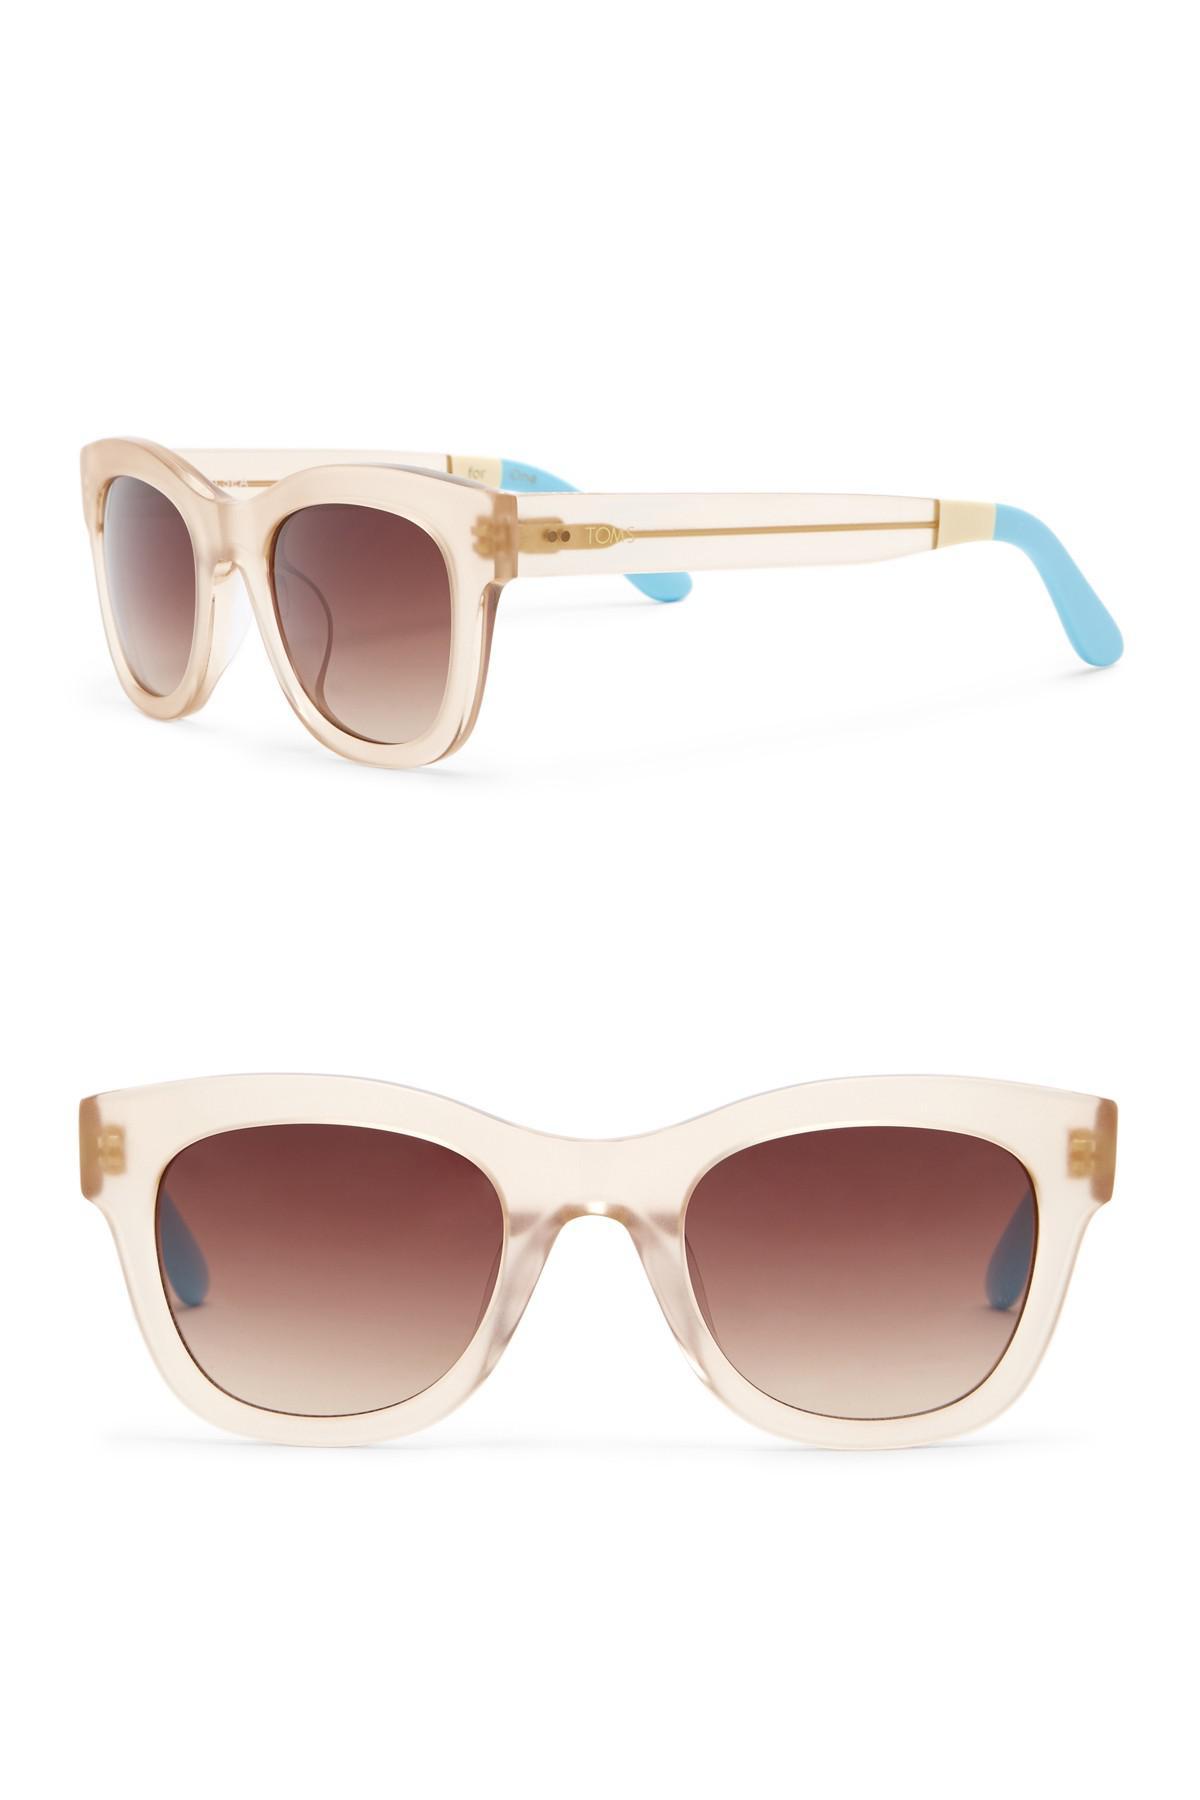 817c014e5b TOMS. Women s Chelsea 50mm Square Sunglasses